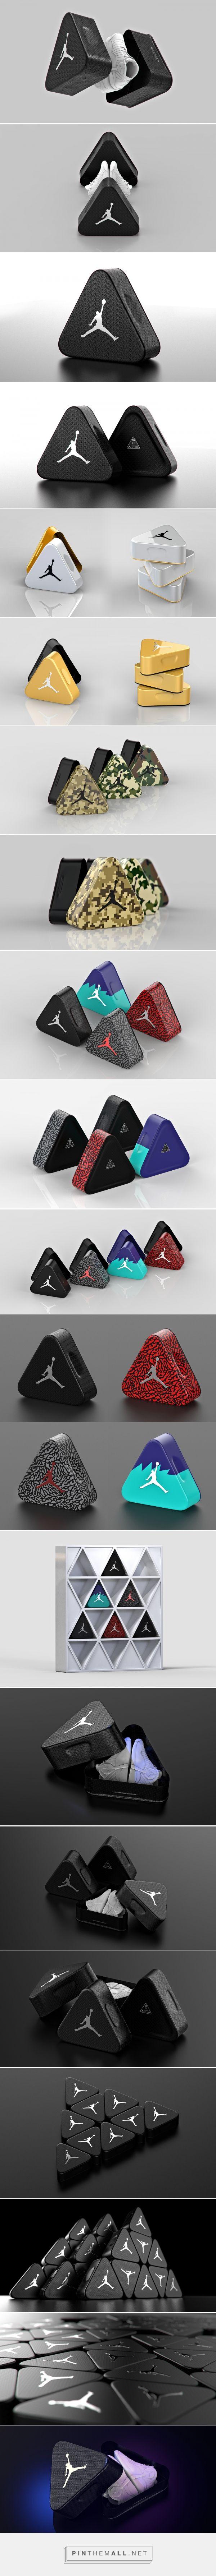 Air Jordan Triangle Shoe box concept packaging by Tomislav Zvonaric -  http   www 32b5c6cb90